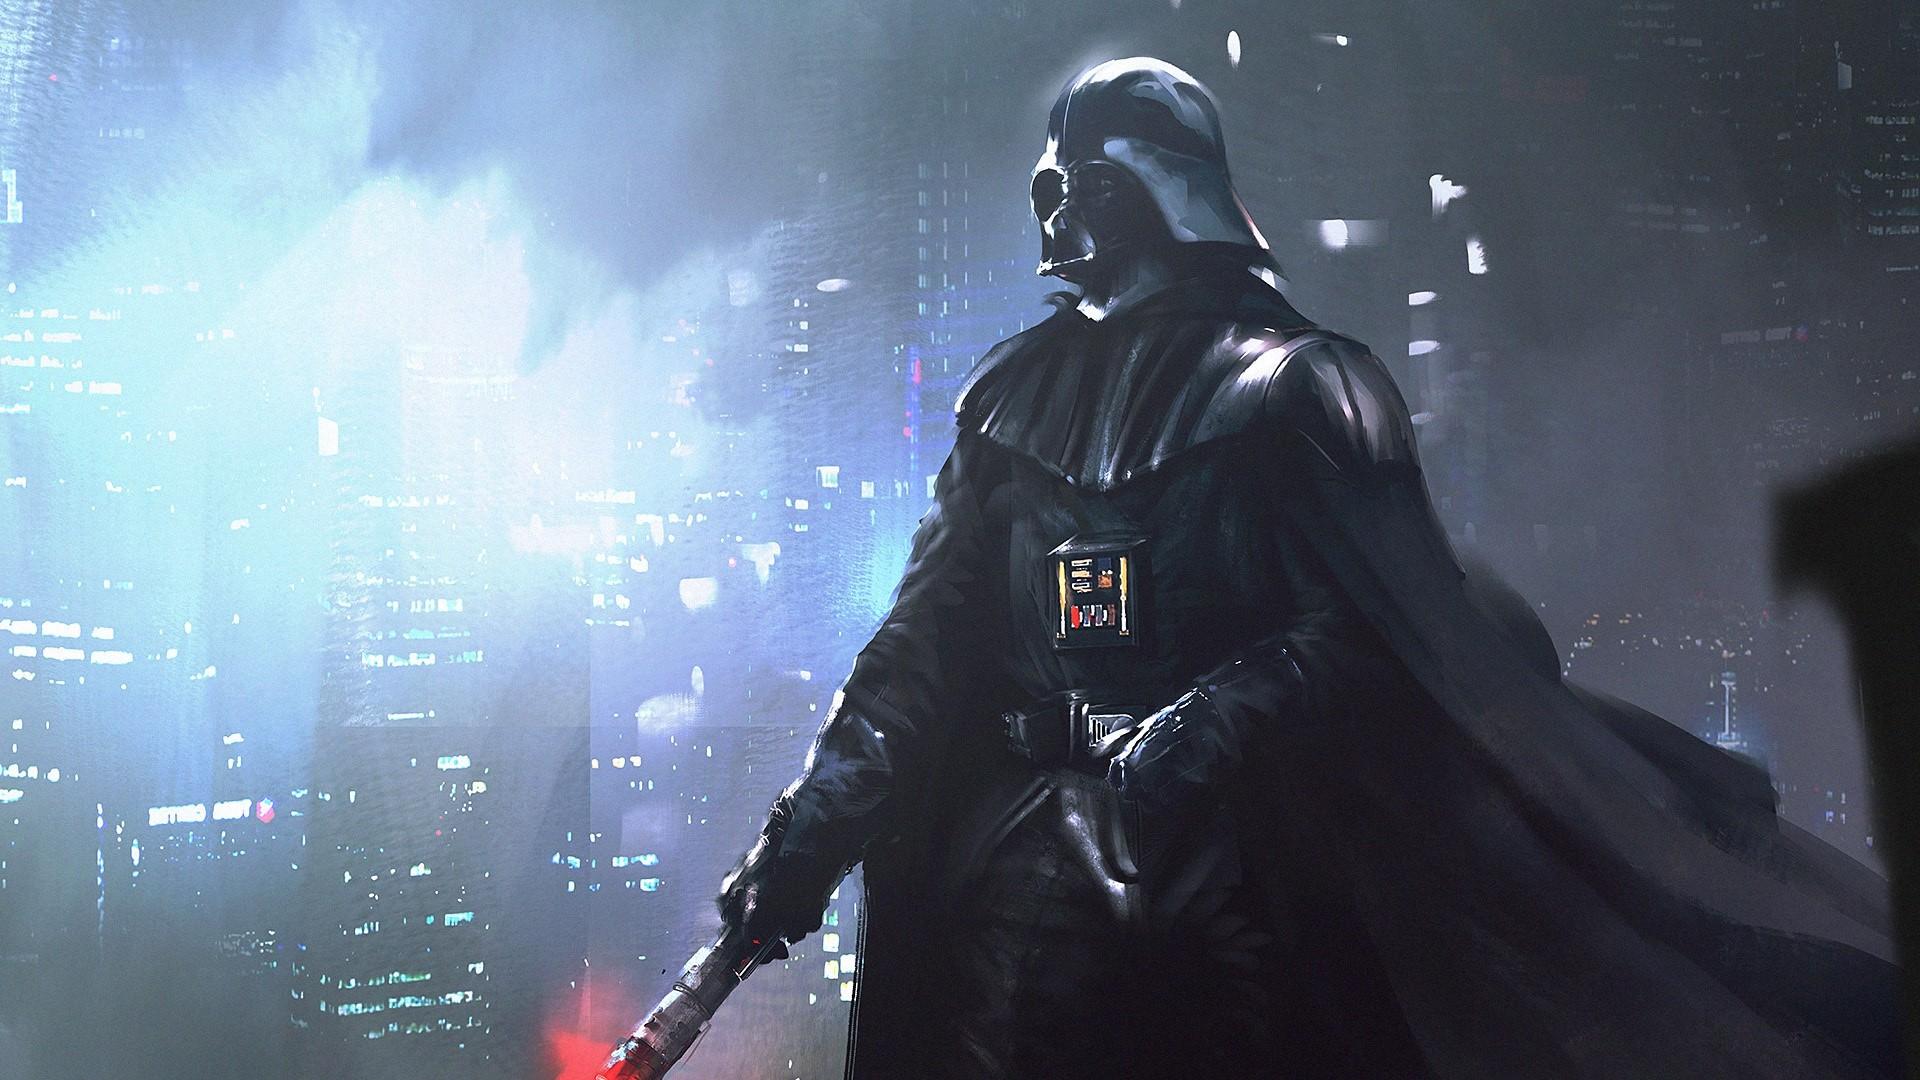 Wallpaper 1920x1080 Px Anakin Skywalker Darth Vader Star Wars 1920x1080 Wallup 1439301 Hd Wallpapers Wallhere